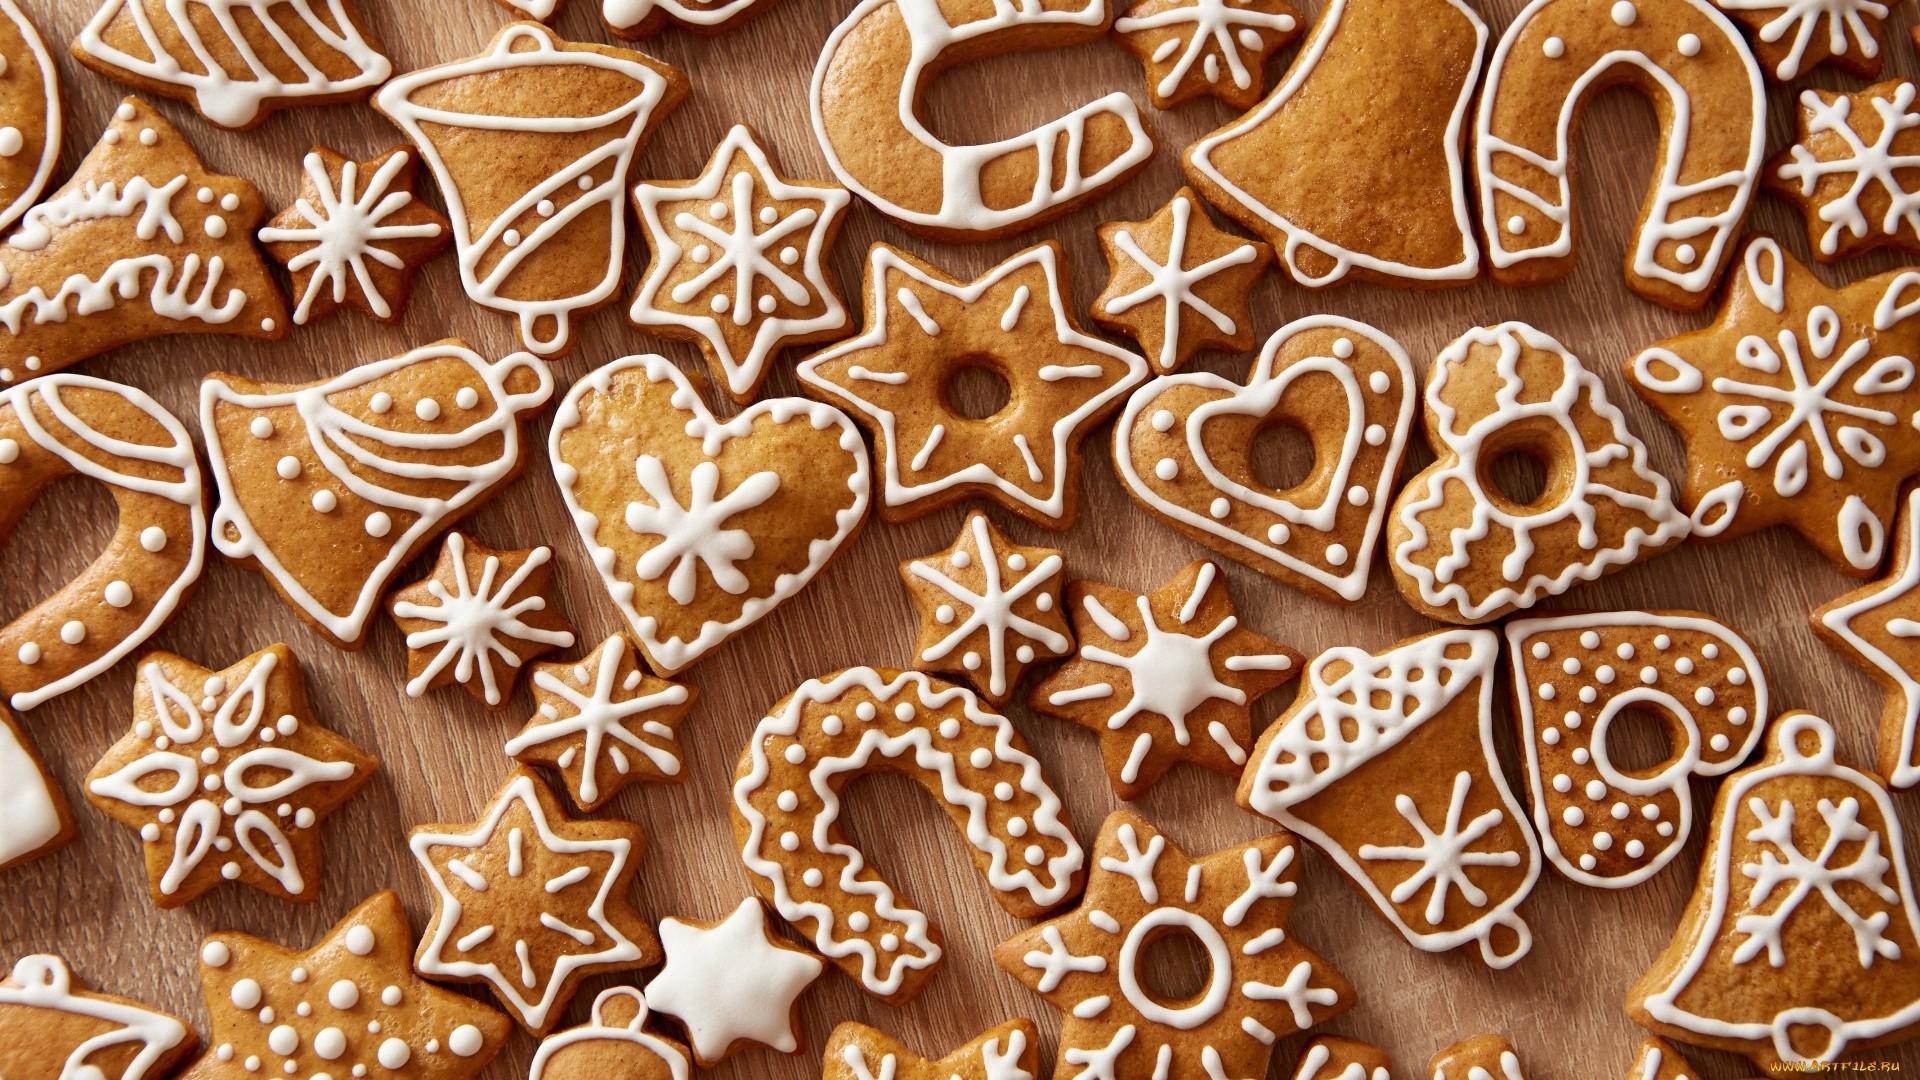 Cookies Wallpaper image hd